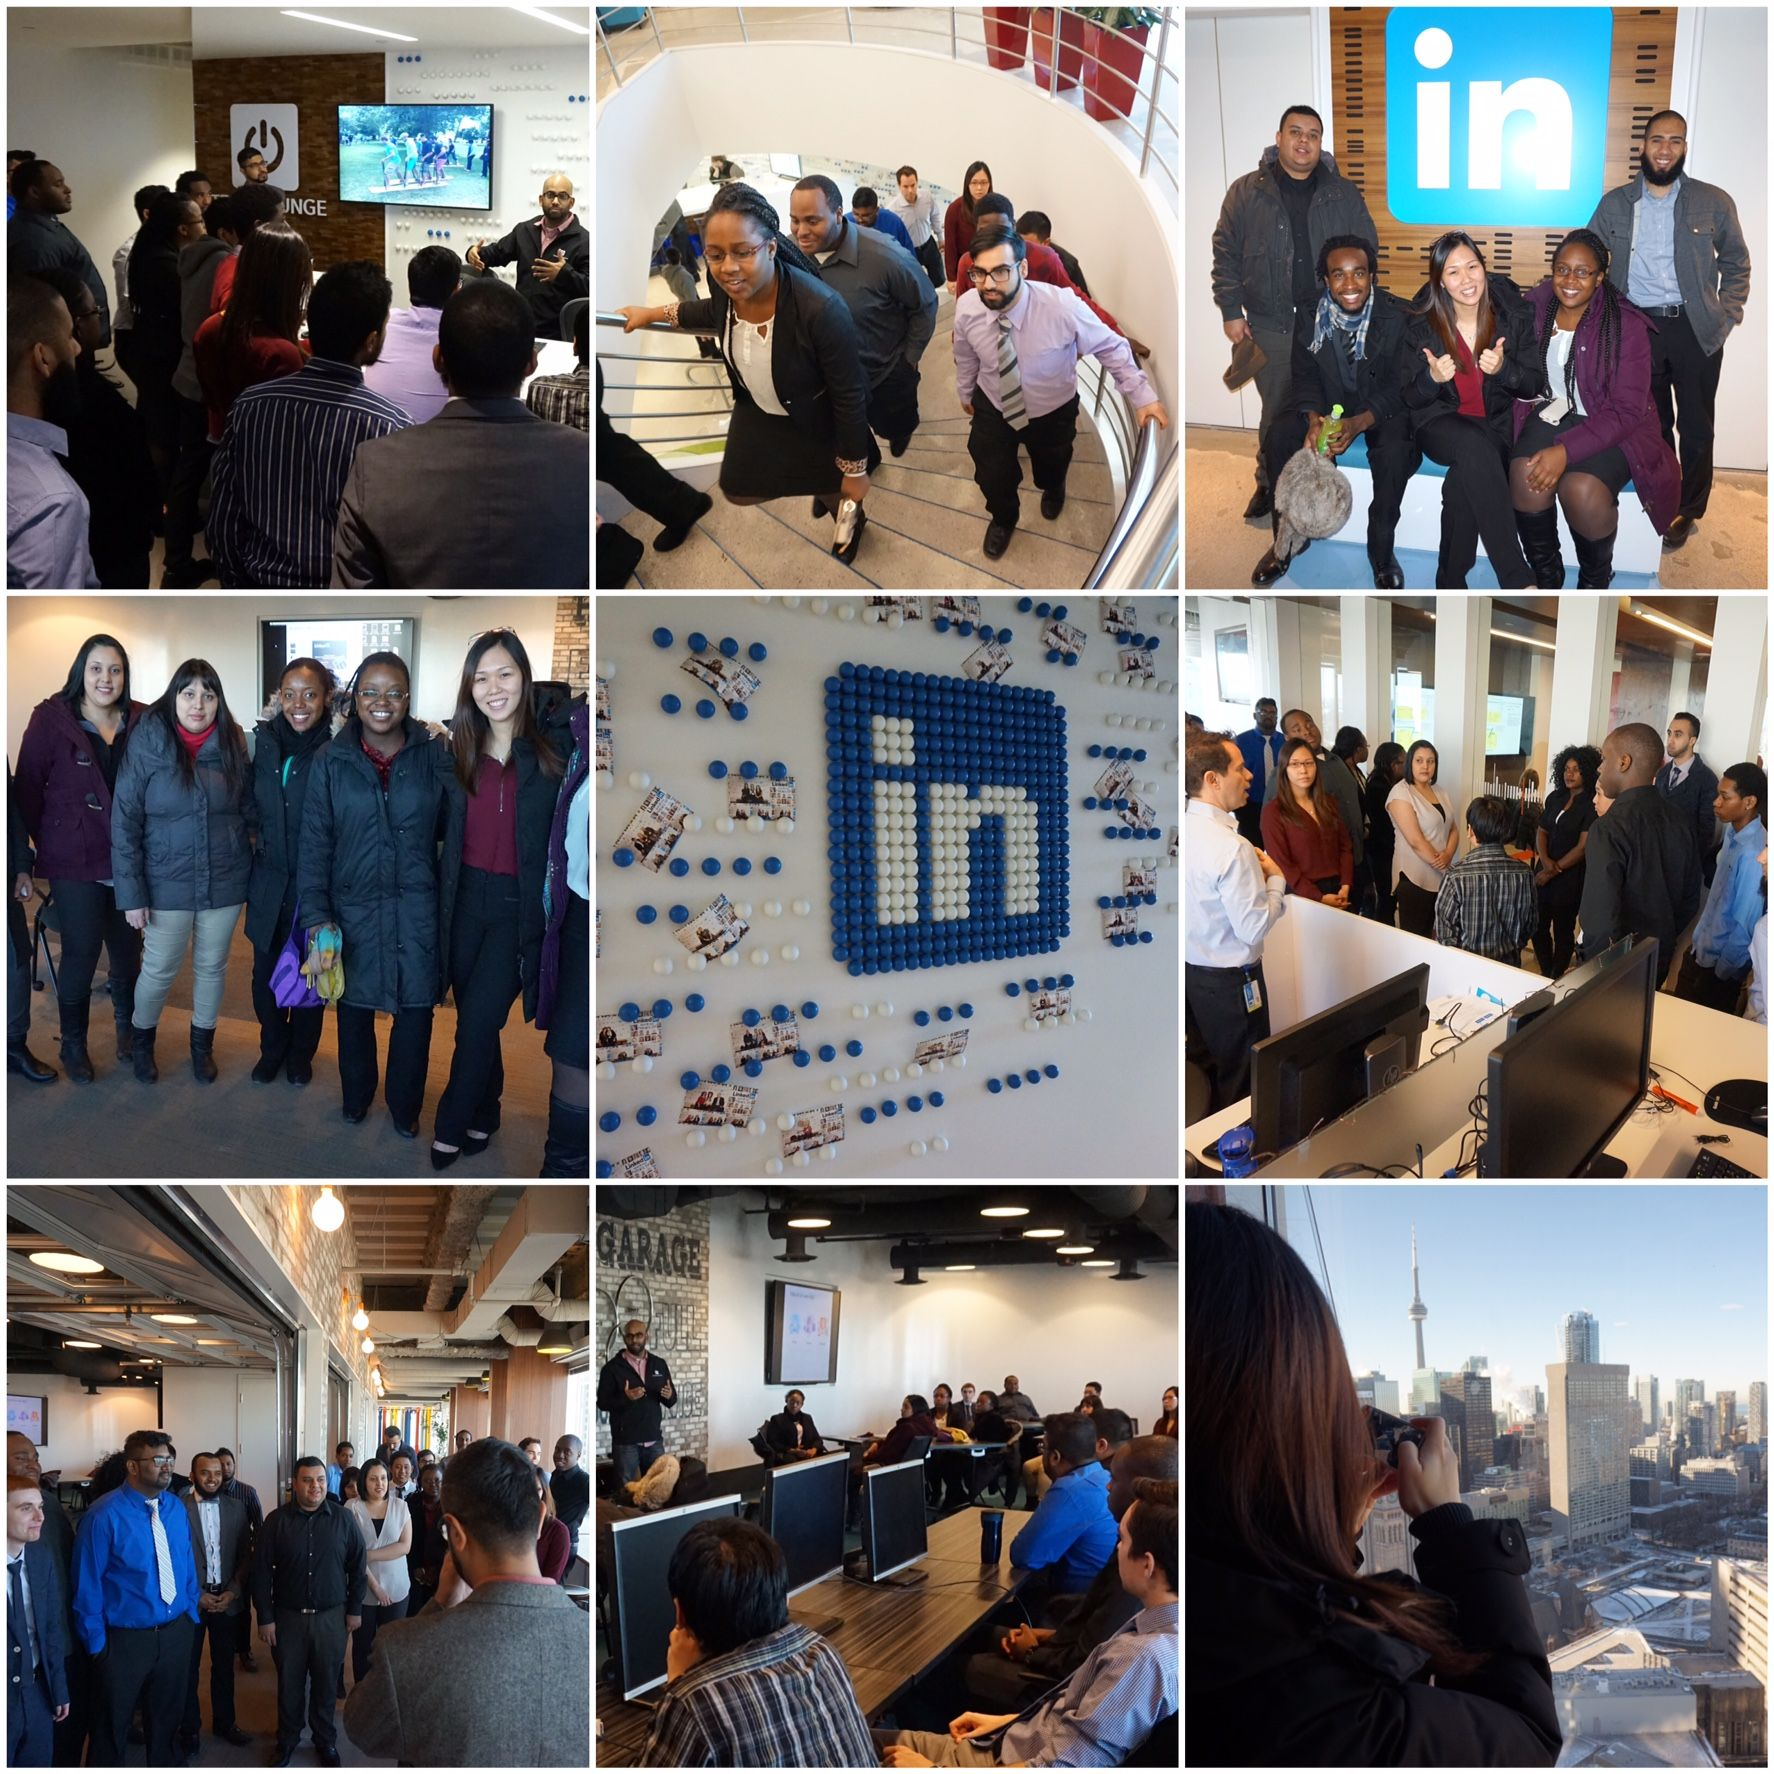 Npower Canada Technology Service Corps Toronto Visits Linkedin